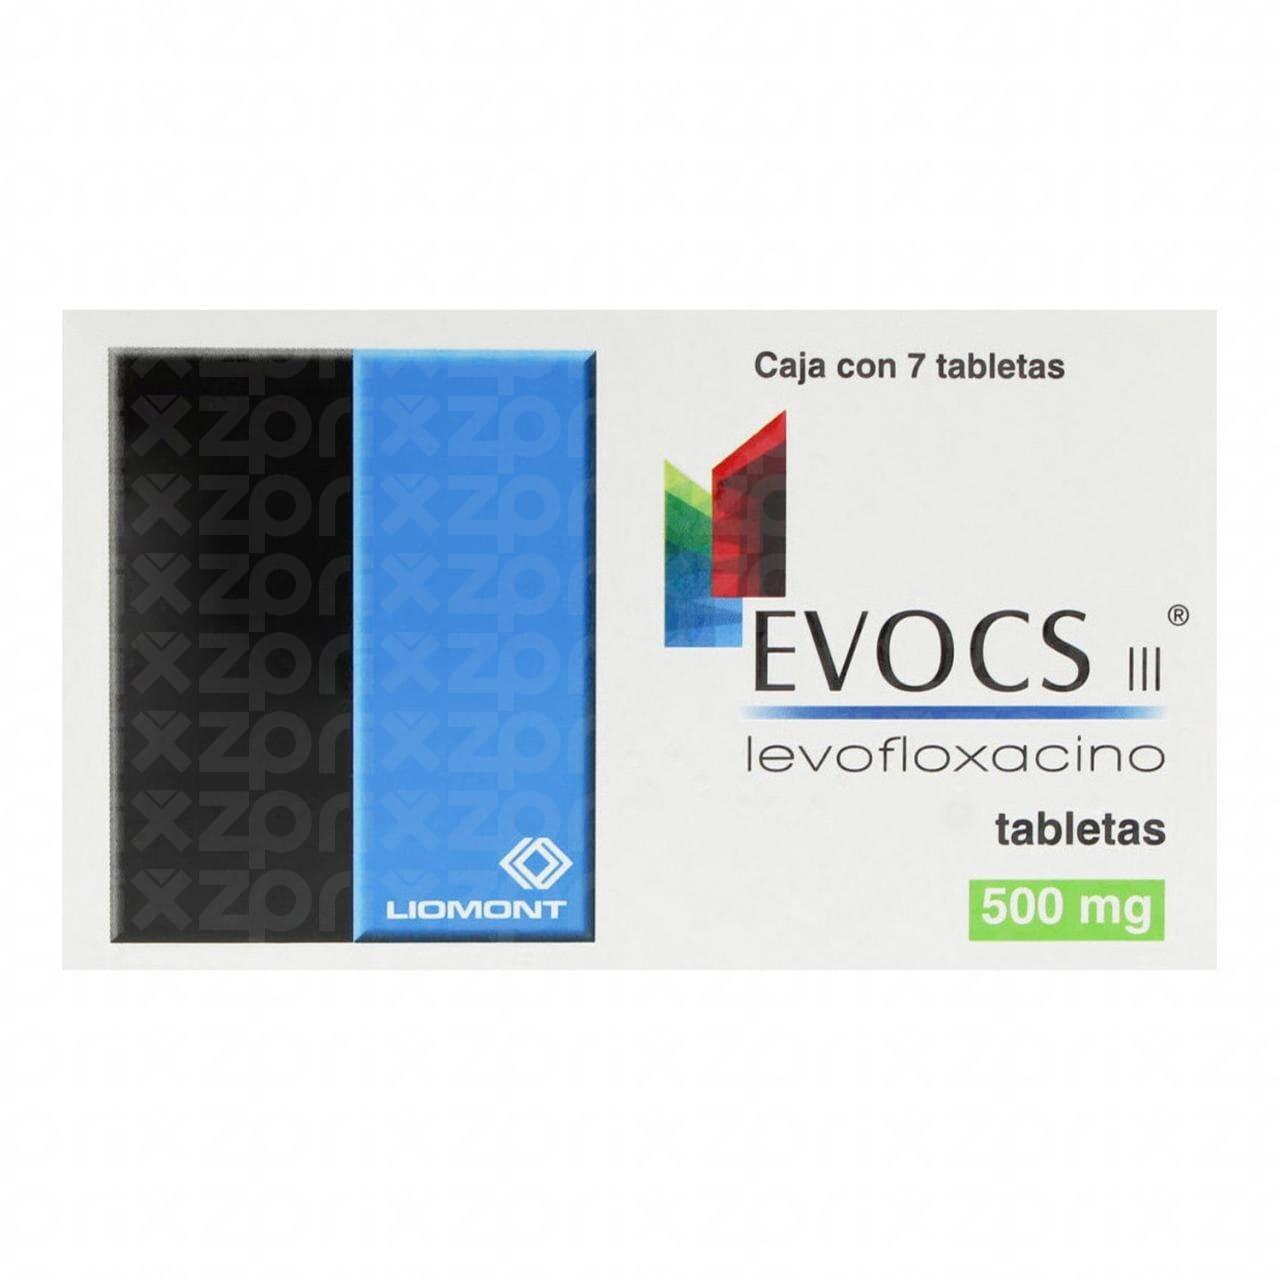 Evocs III 500 mg oral 7 tabletas